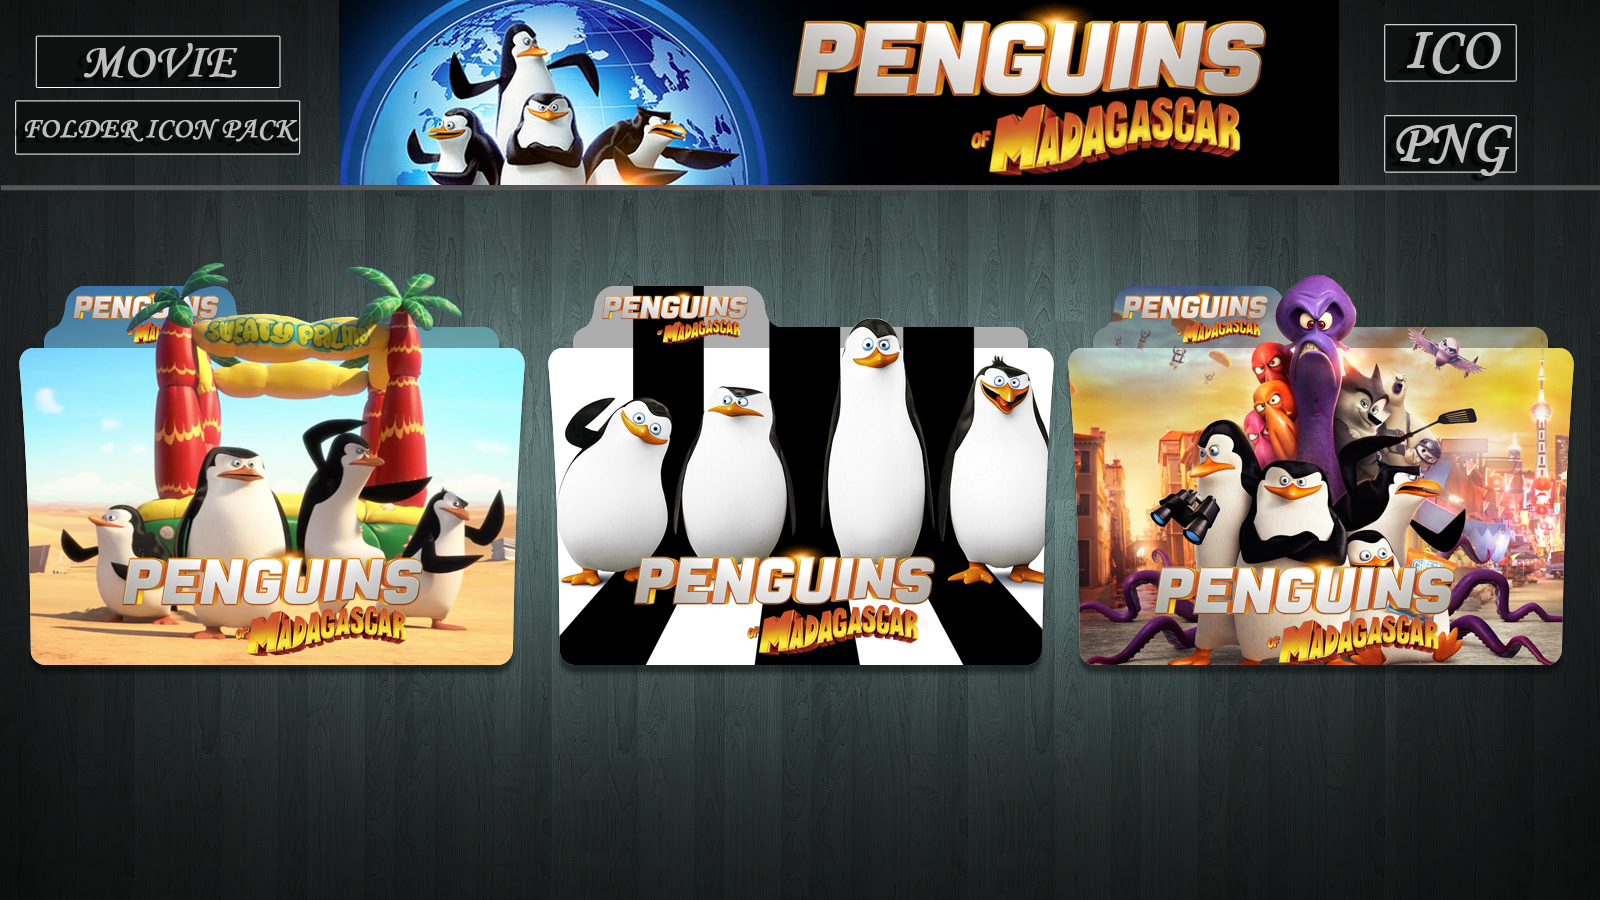 Penguins Of Madagascar 2014 Folder Icon Pack By Zsotti60 On Deviantart